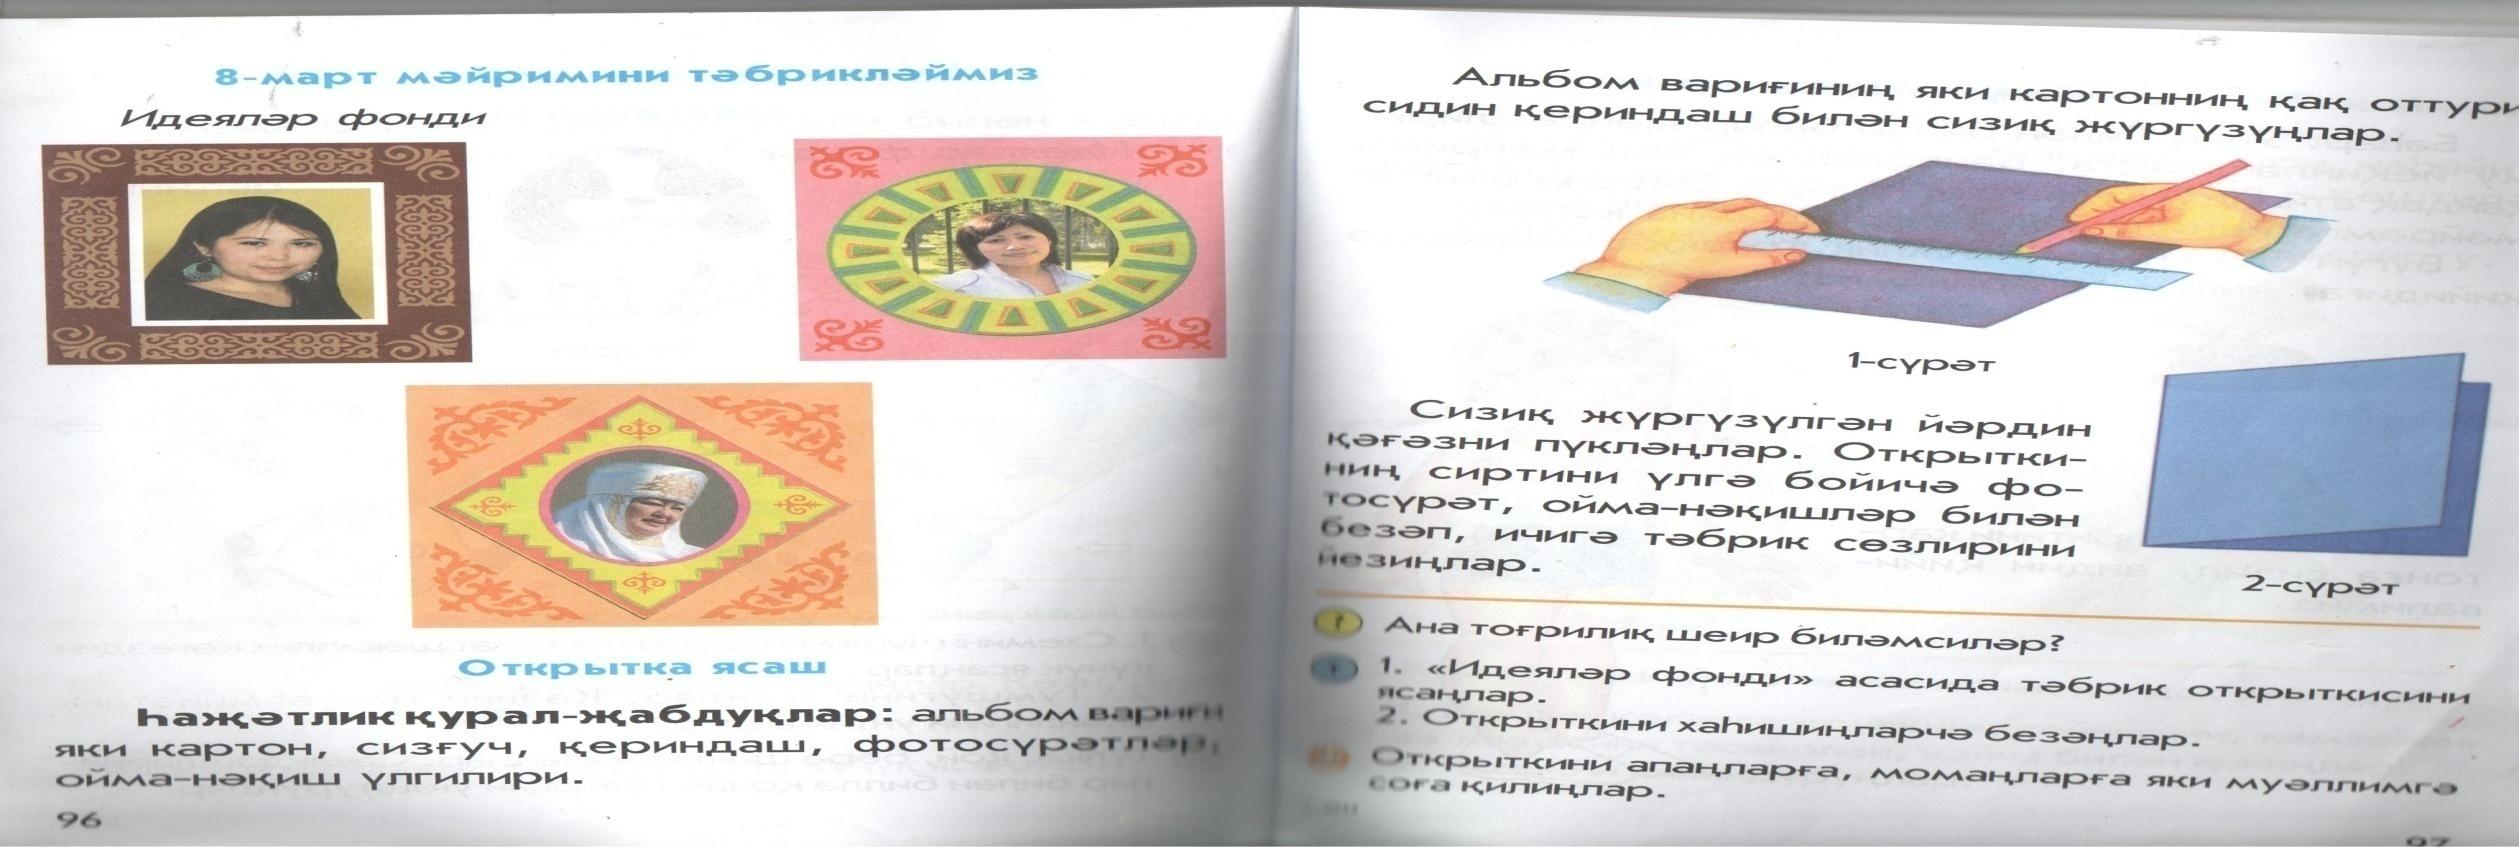 C:\Users\777\Documents\Scanned Documents\Рисунок (26).jpg